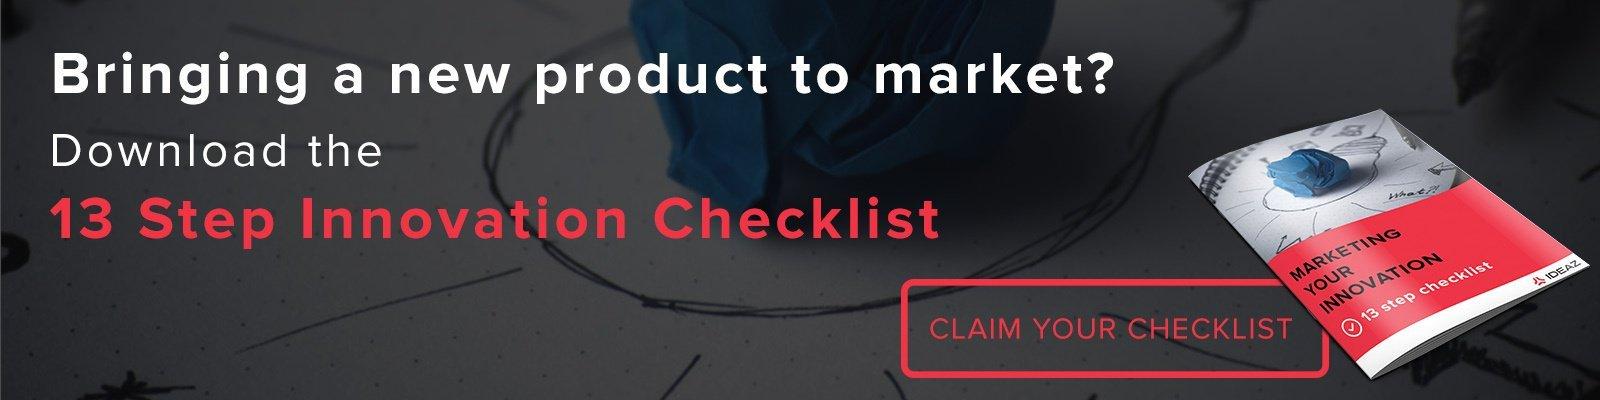 product innovation checklist